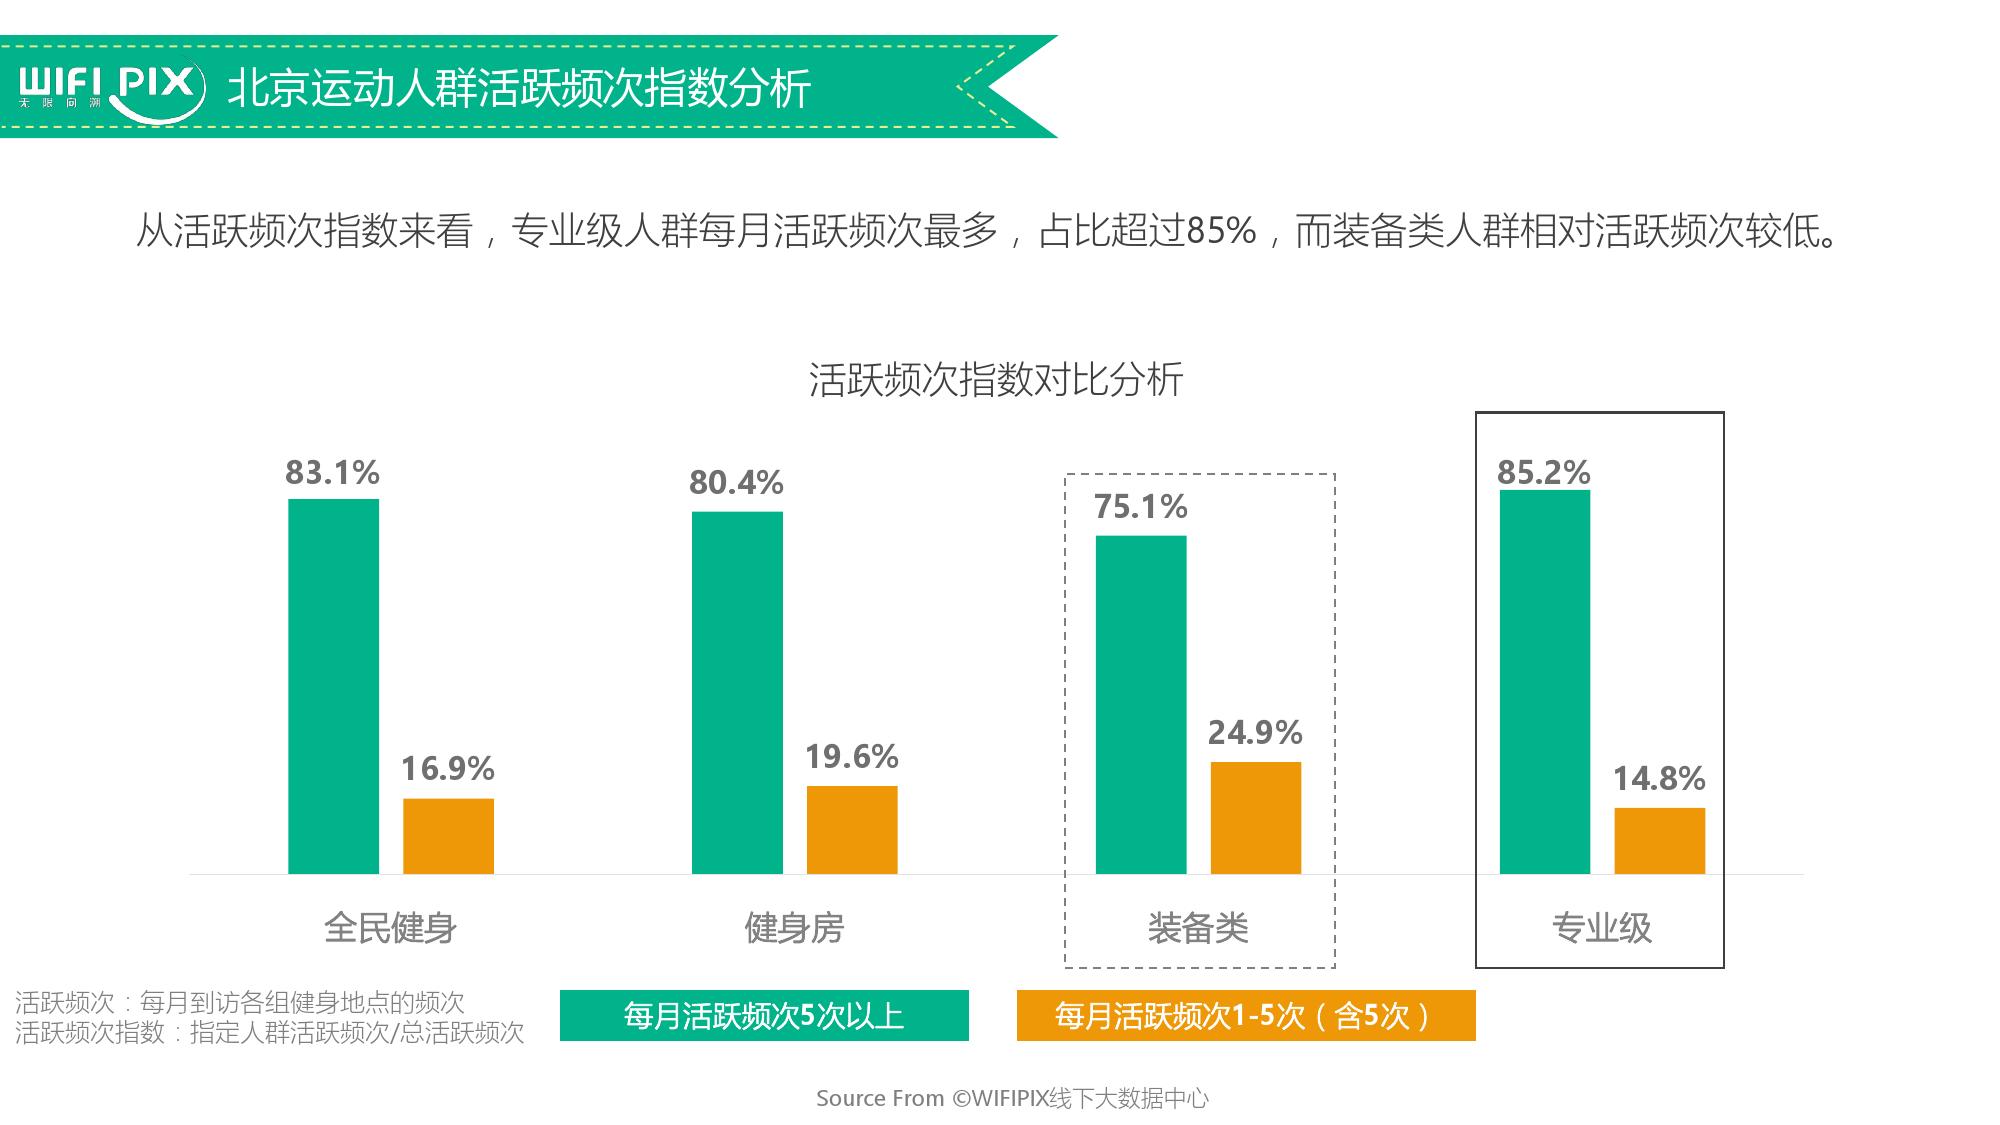 2016%e5%8c%97%e4%ba%ac%e4%bd%93%e8%82%b2%e8%bf%90%e5%8a%a8%e4%ba%ba%e7%be%a4%e6%95%b0%e6%8d%ae%e6%b4%9e%e5%af%9f%e5%88%86%e6%9e%90%e6%8a%a5%e5%91%8a_000018